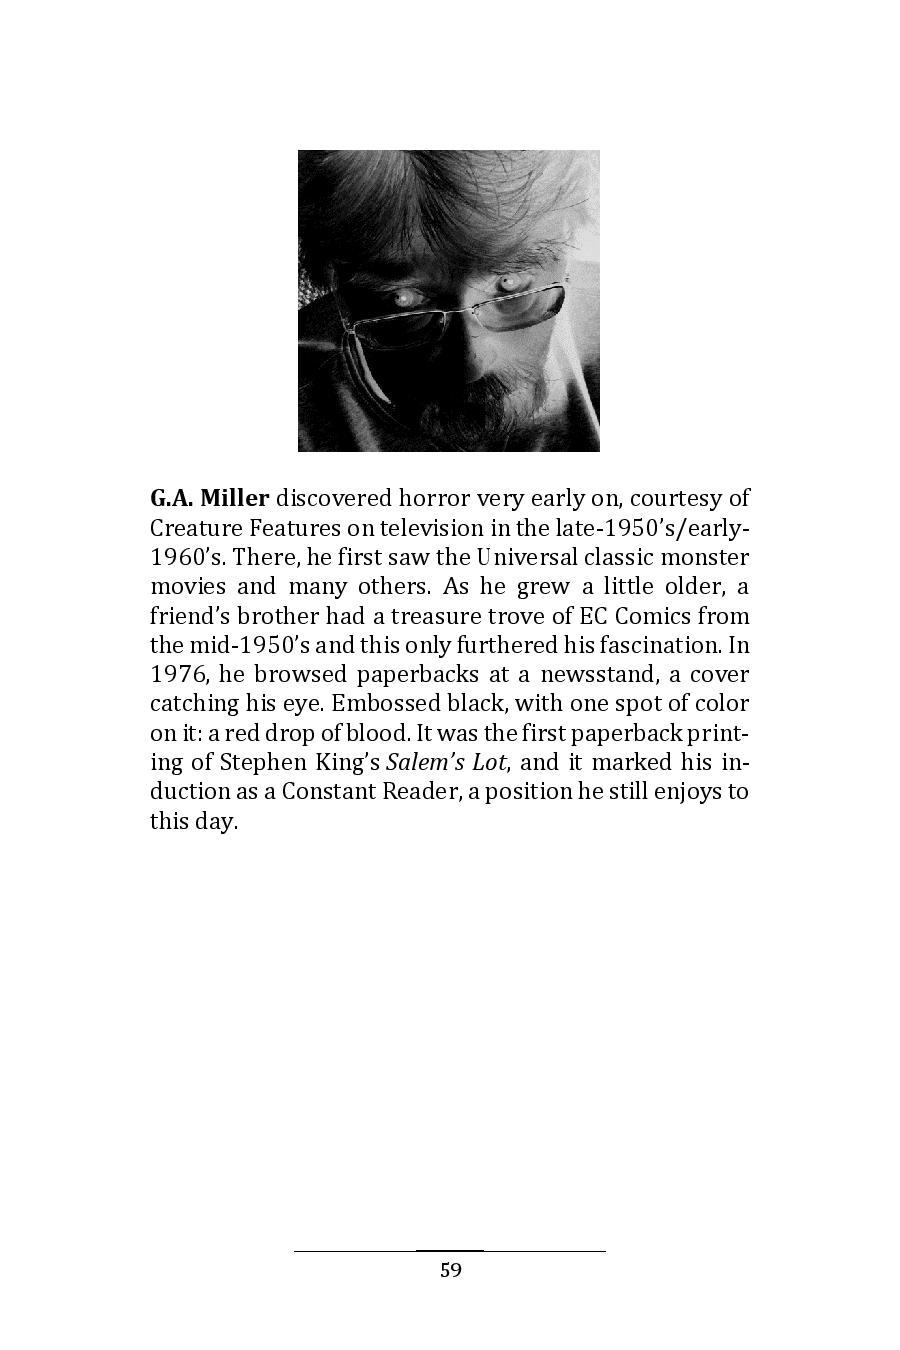 Hinnom Magazine 001 Manuscript 10-page-063